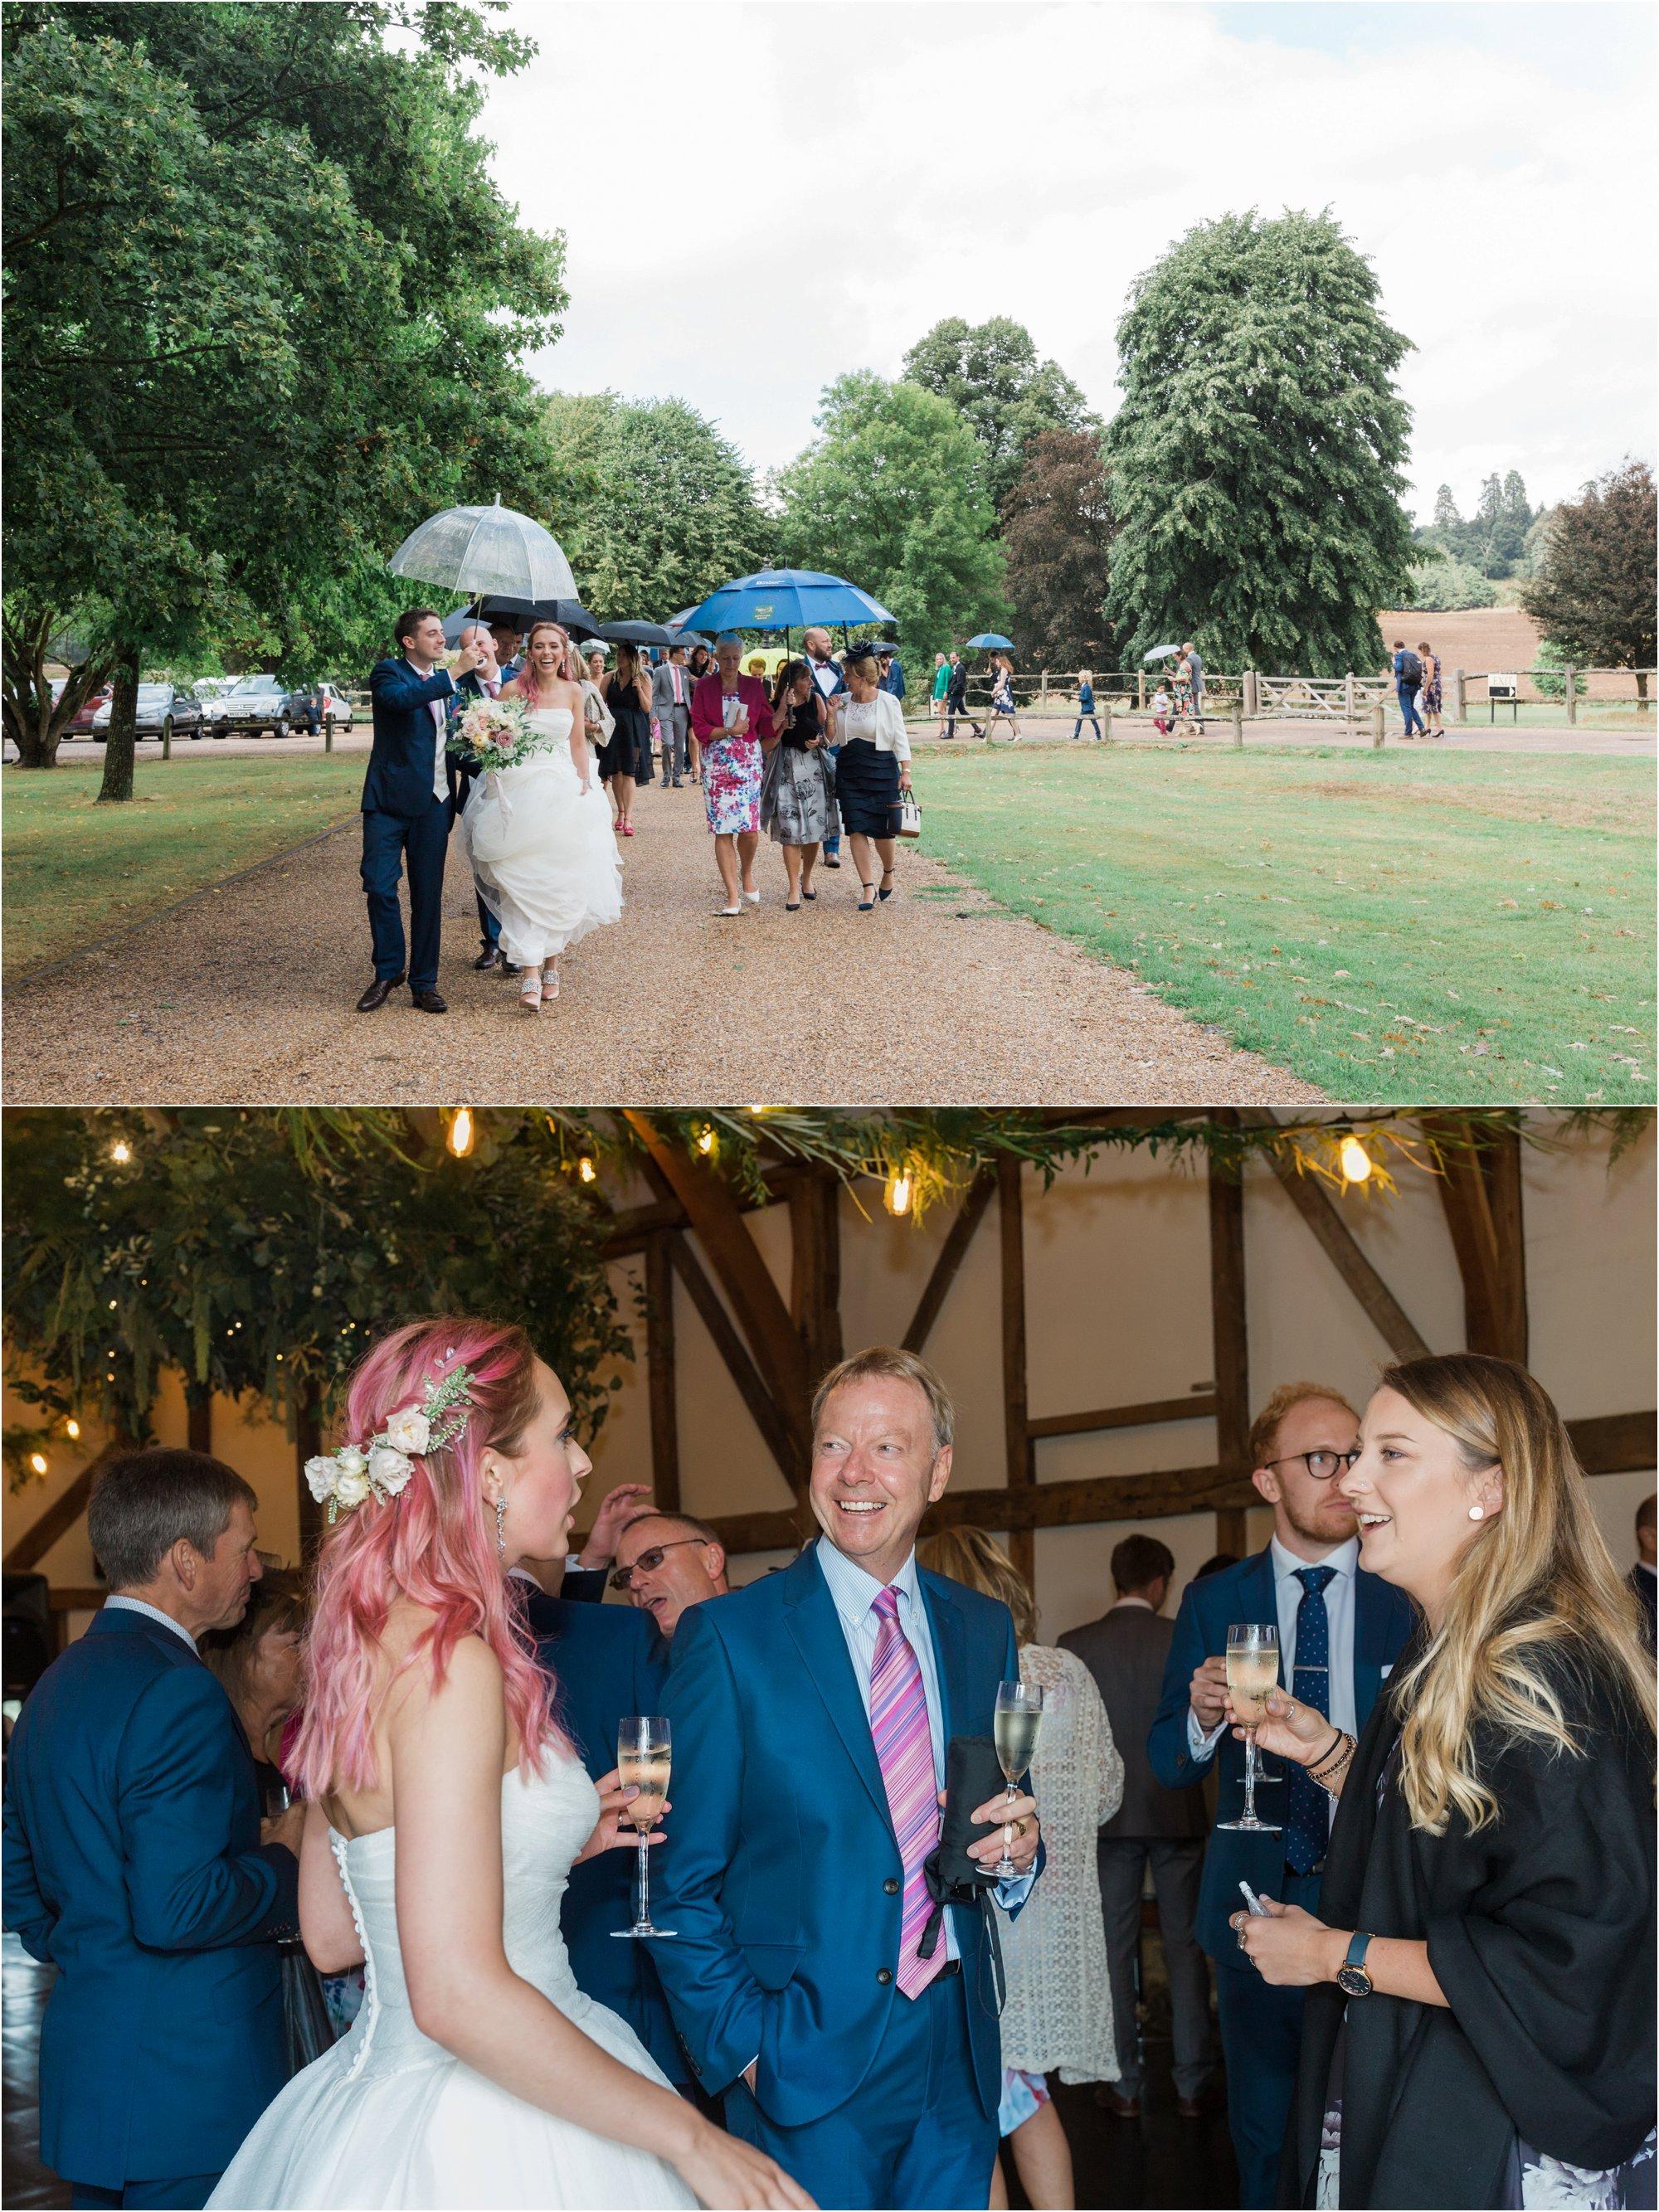 Loseley Park wedding in the rain